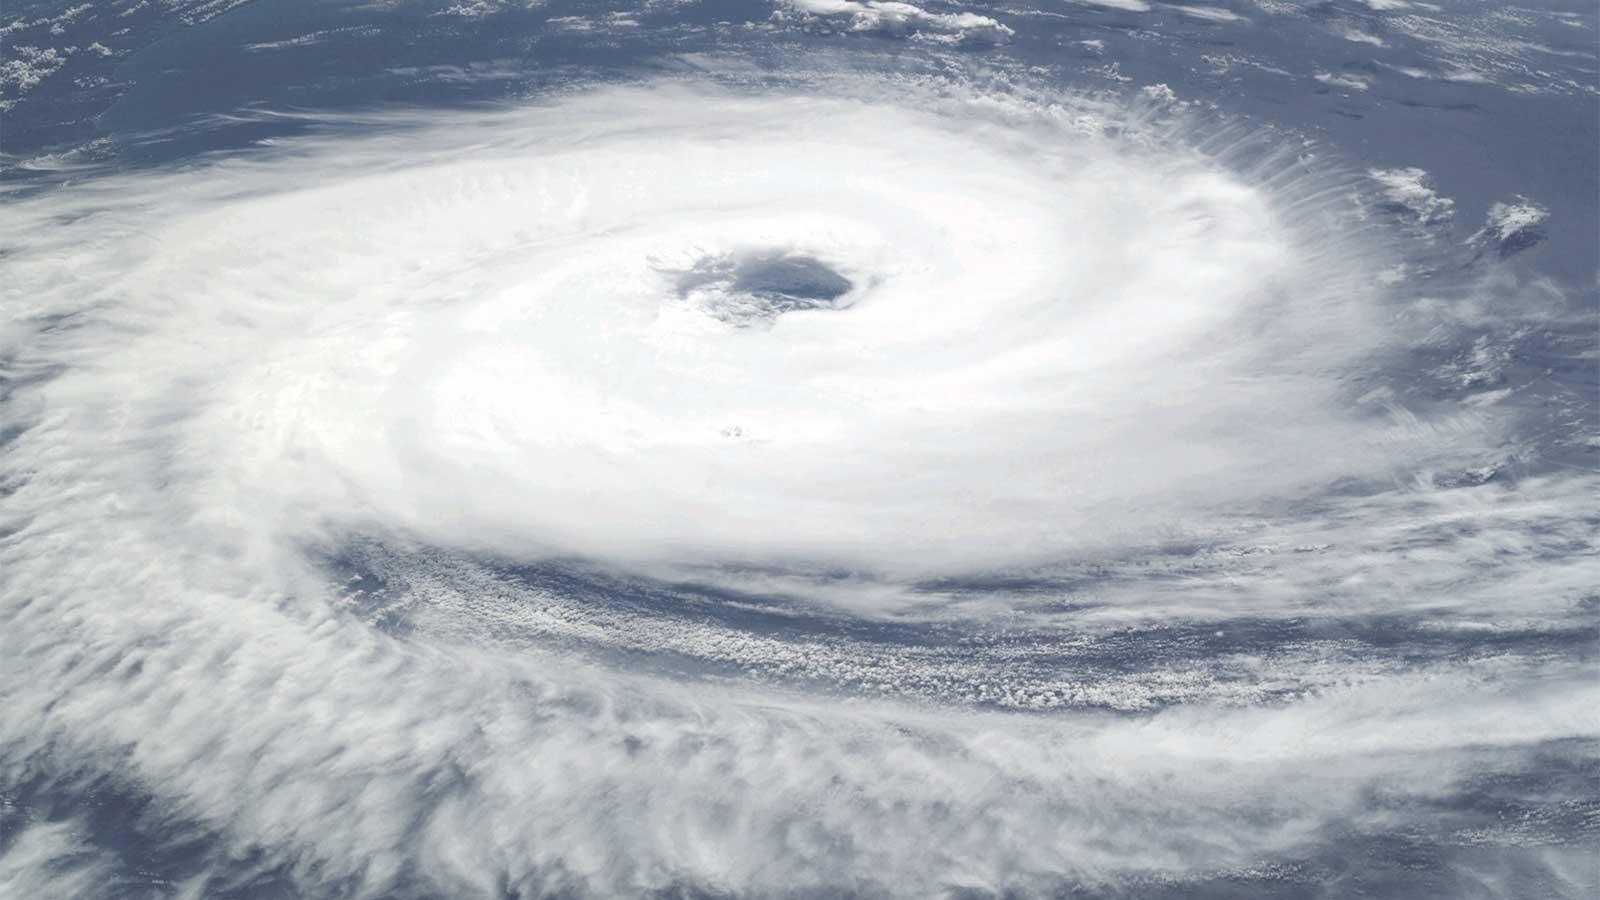 Cozumel My Cozumel hurricane preparedness